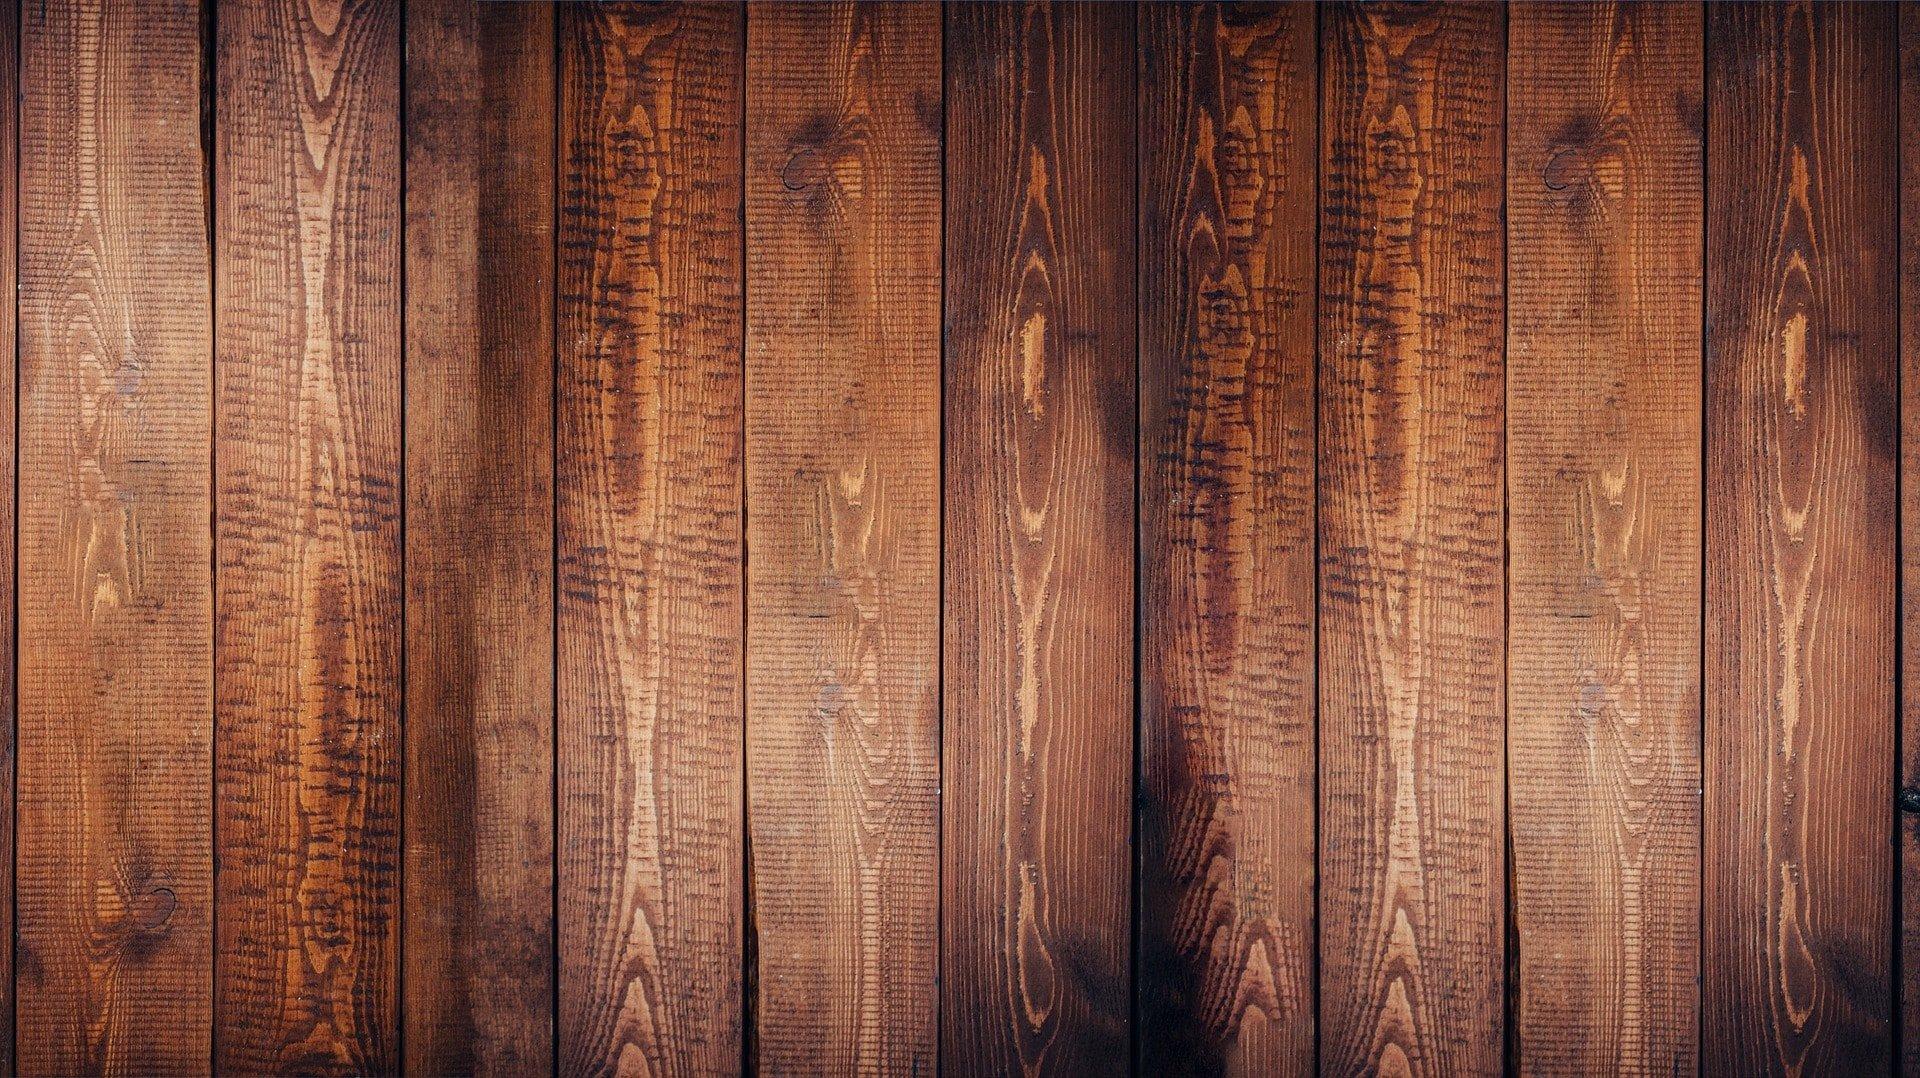 TOUGH-GRID-Wood-Background